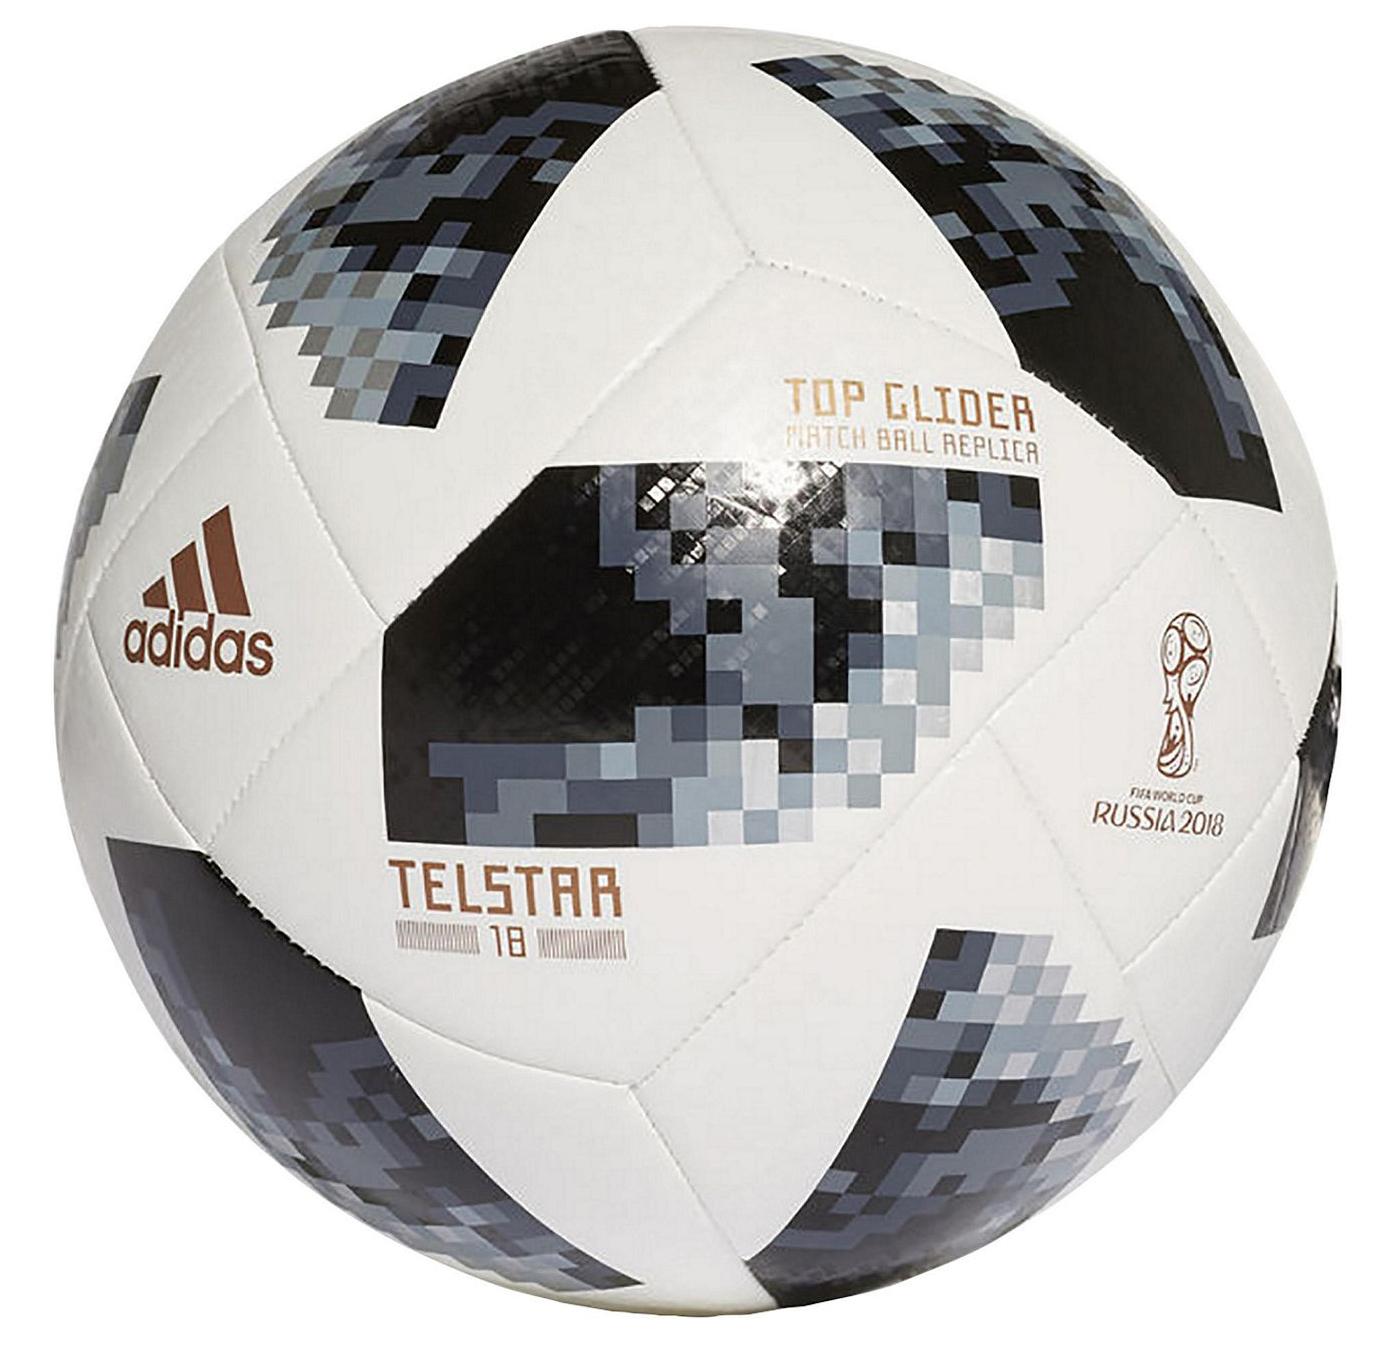 adidas Telstar FIFA World Cup Top Glider Football(free C&C) £10 @ Tesco Direct